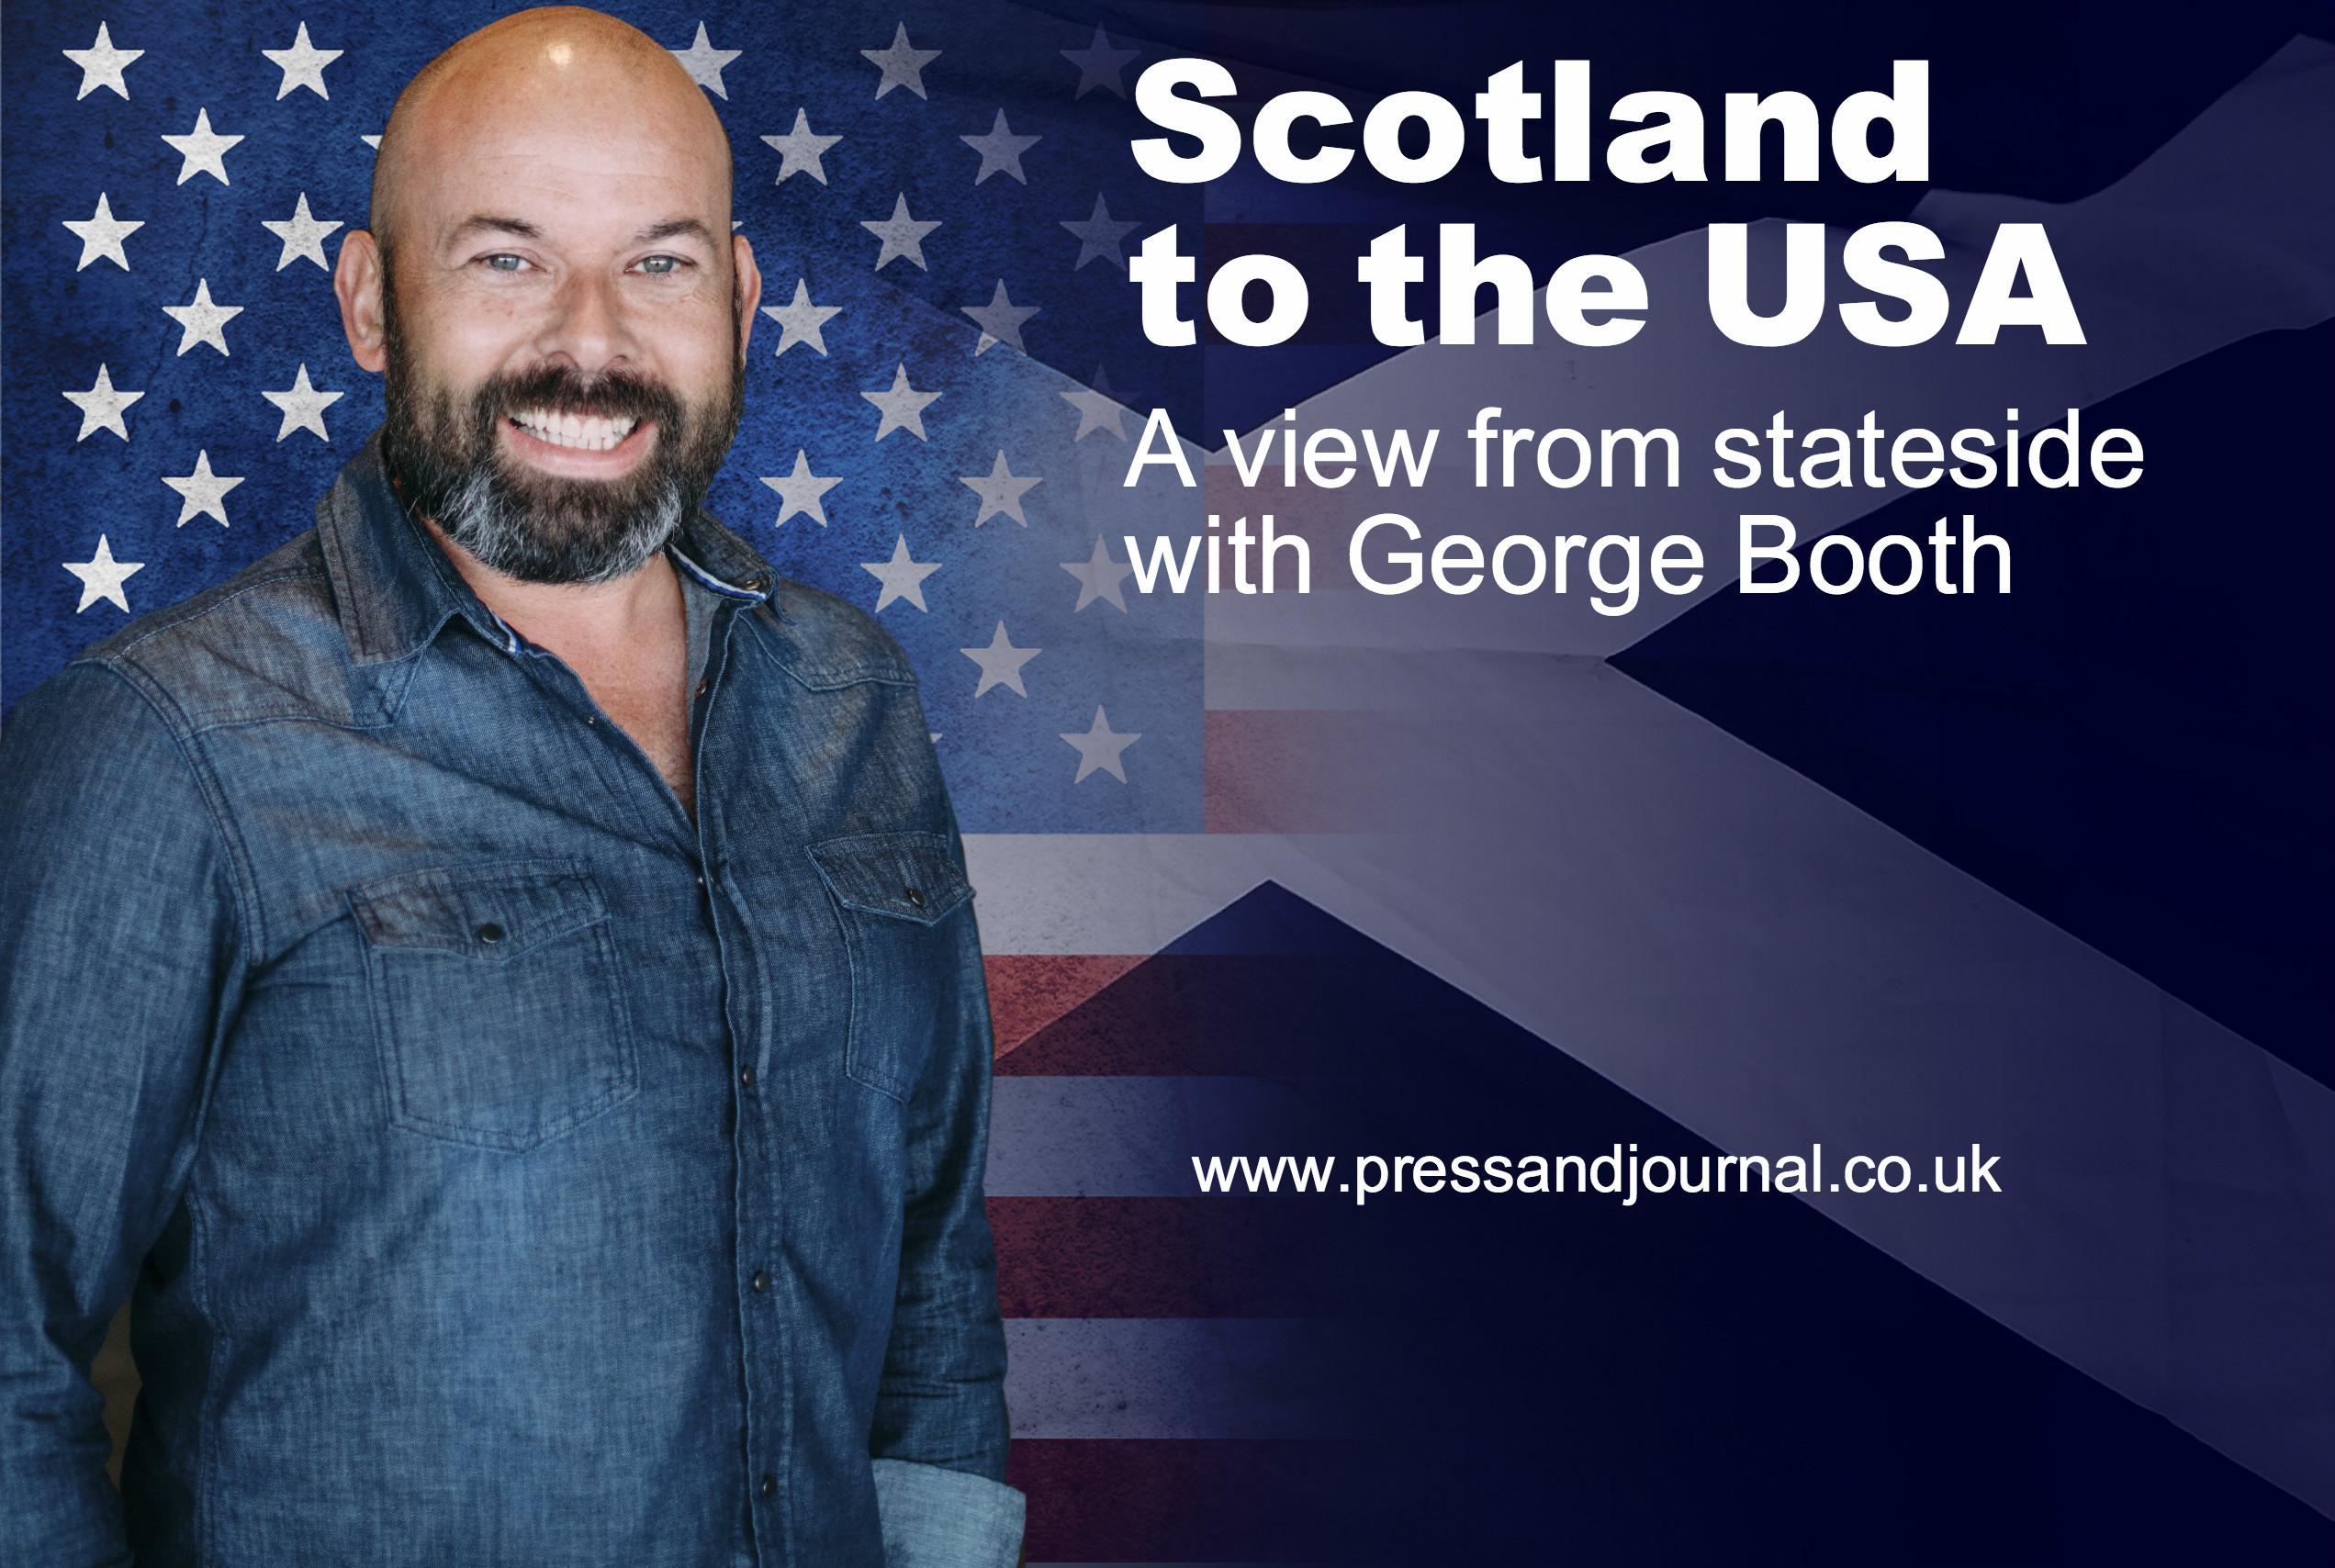 Scotland to the USA